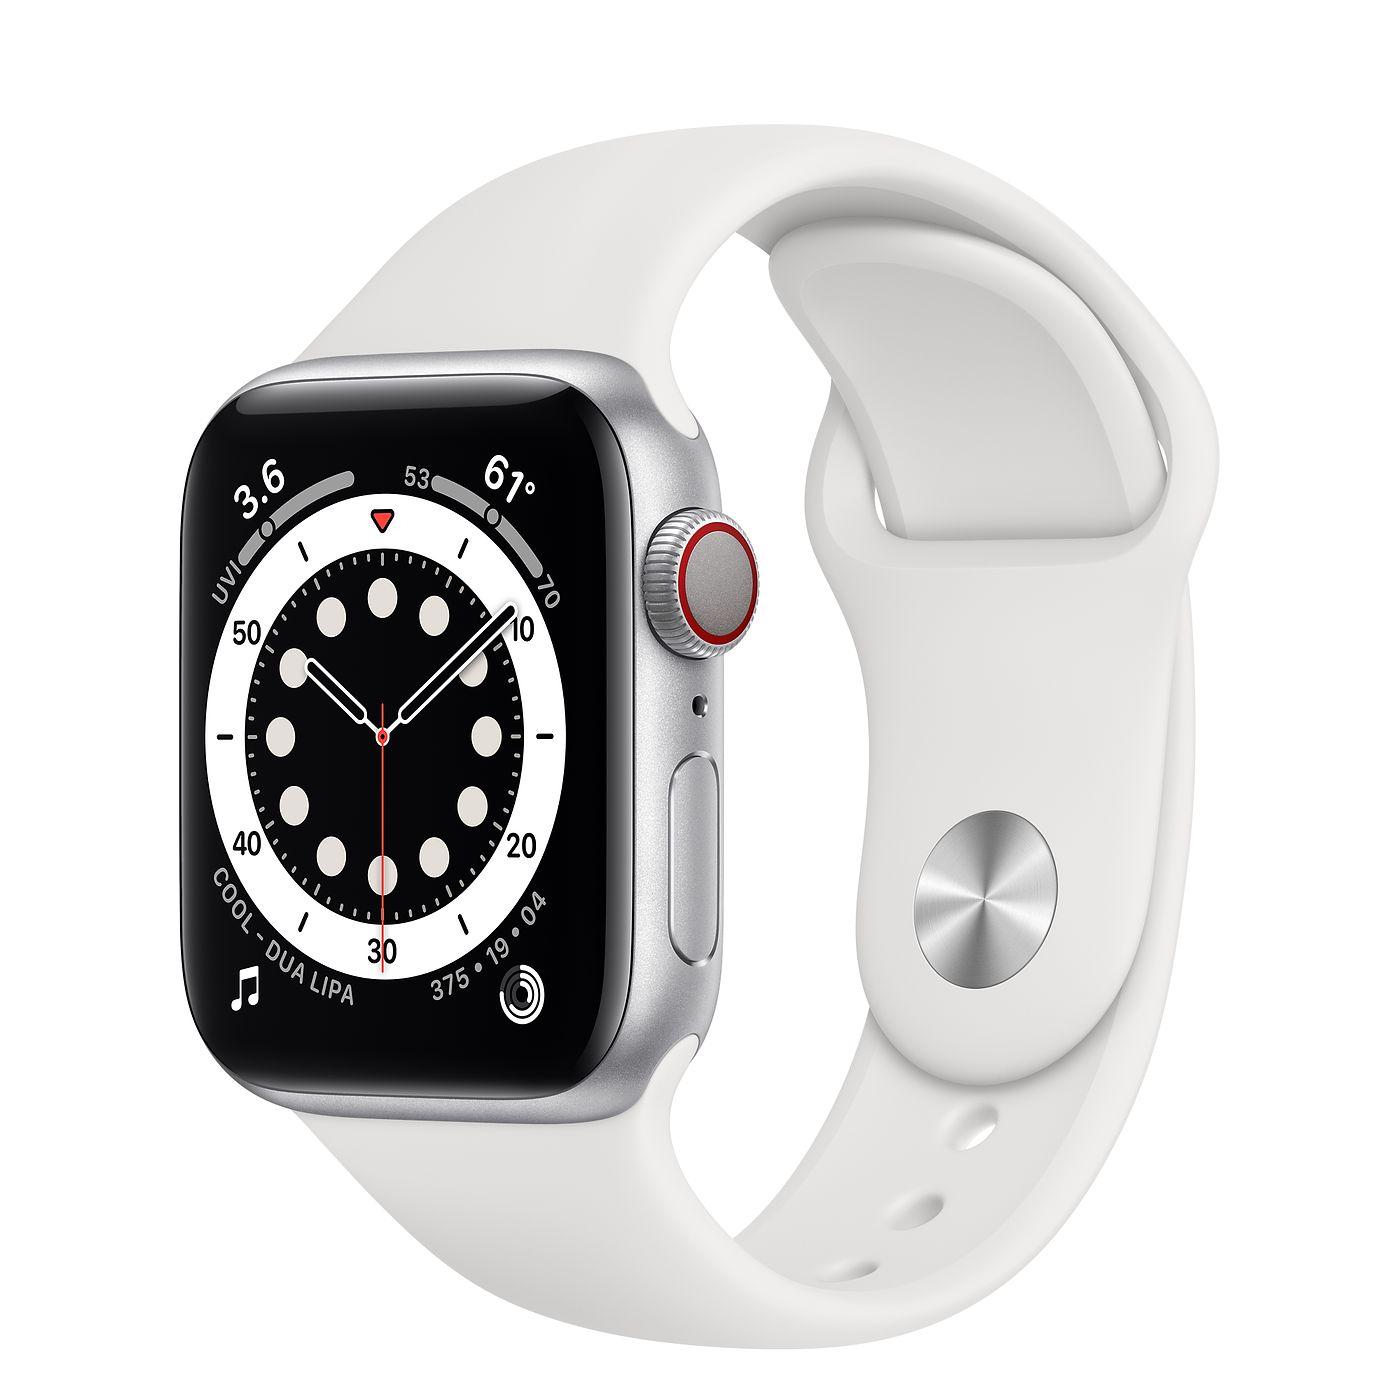 Apple 2020년 애플워치 6 GPS + 셀룰러 40mm 레귤러, 실버 알루미늄(케이스), 화이트(스포츠 밴드)